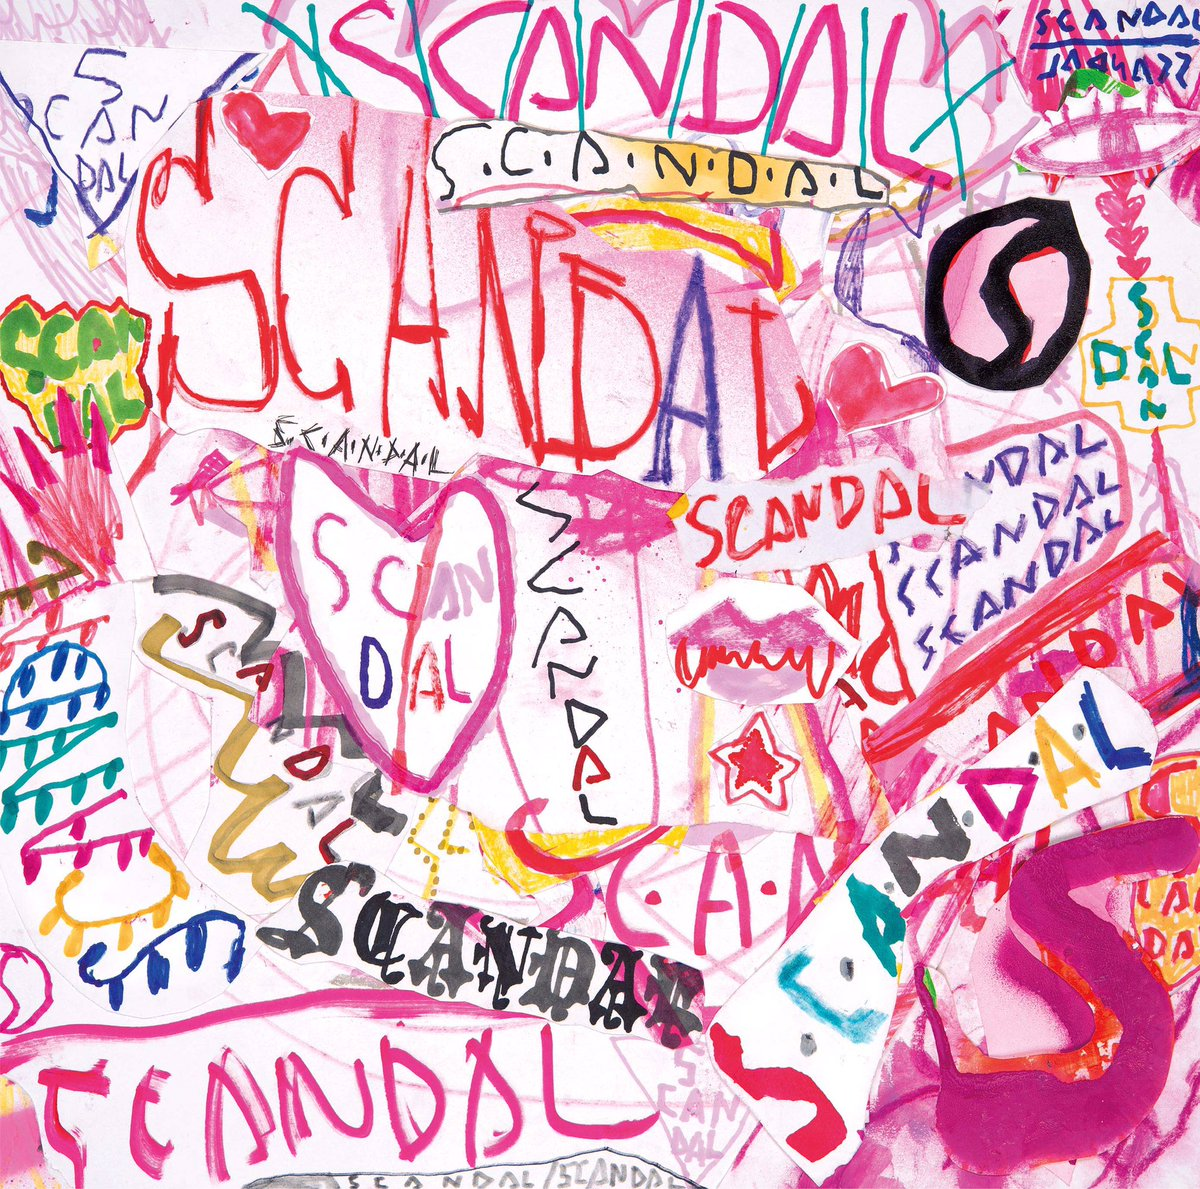 【NEW】 BEST ALBUM『SCANDAL』リリース記念特別抽選会詳細決定のお知らせ! #SC…